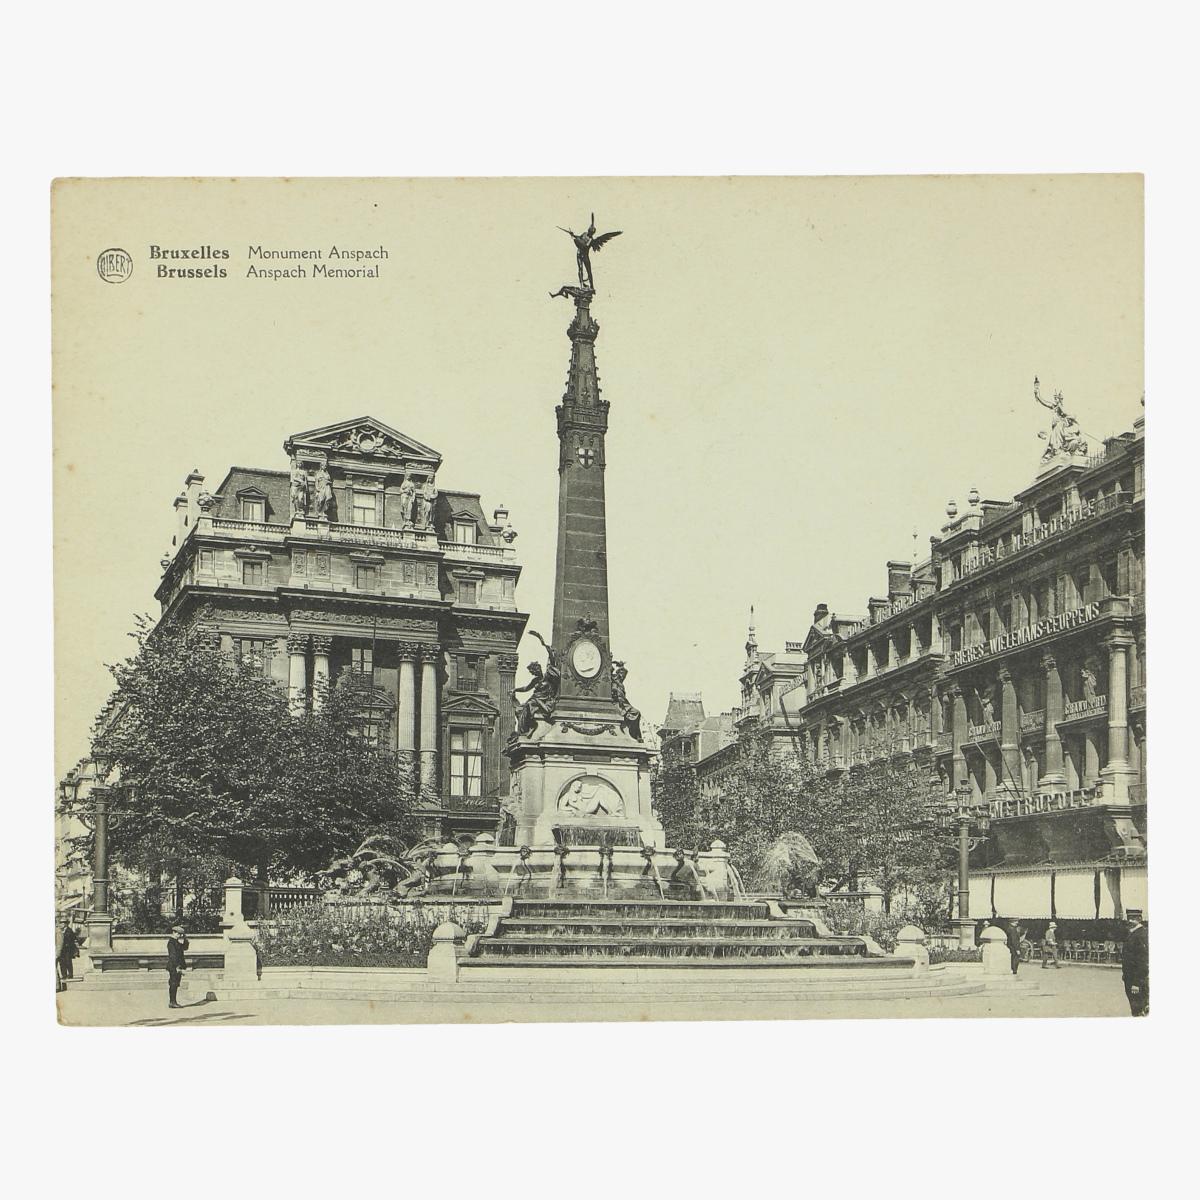 Afbeeldingen van oude postkaart bruxelles monument anspach